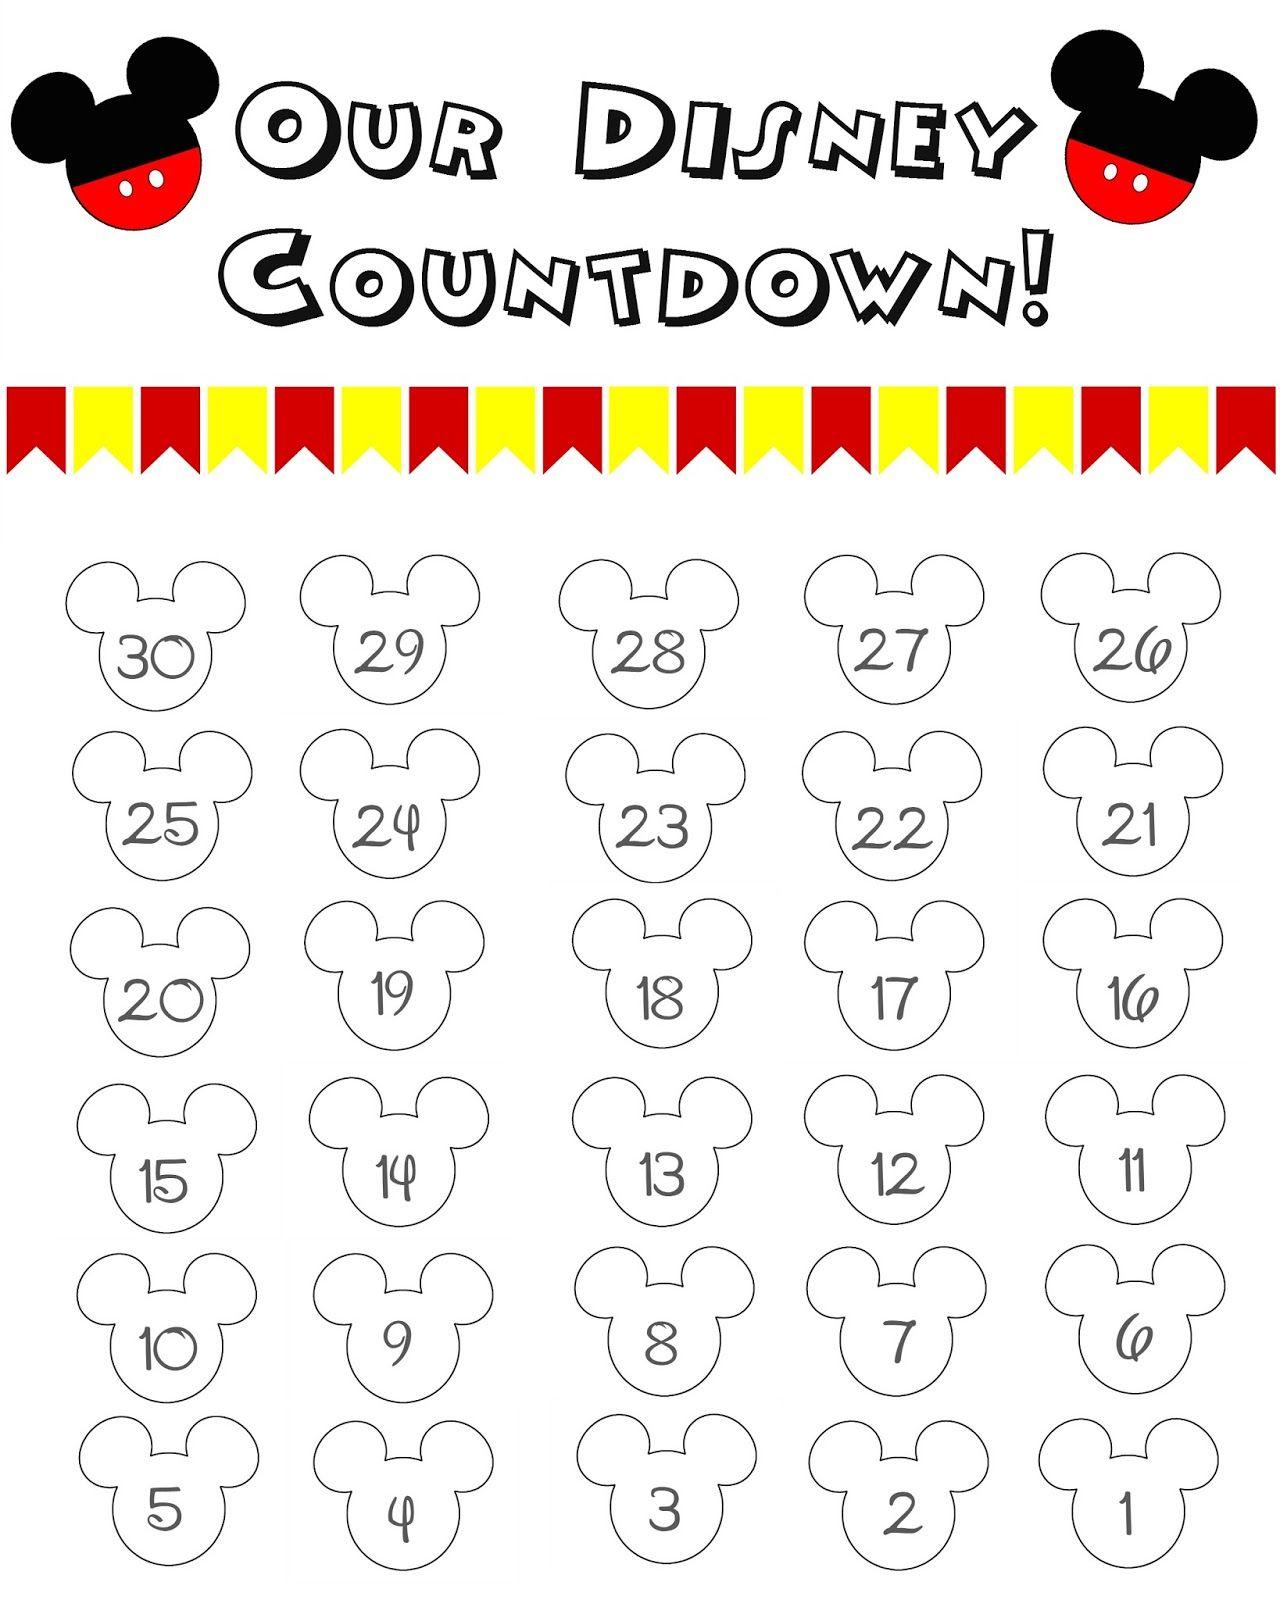 Disney World Countdown Calendar - Free Printable | Disney